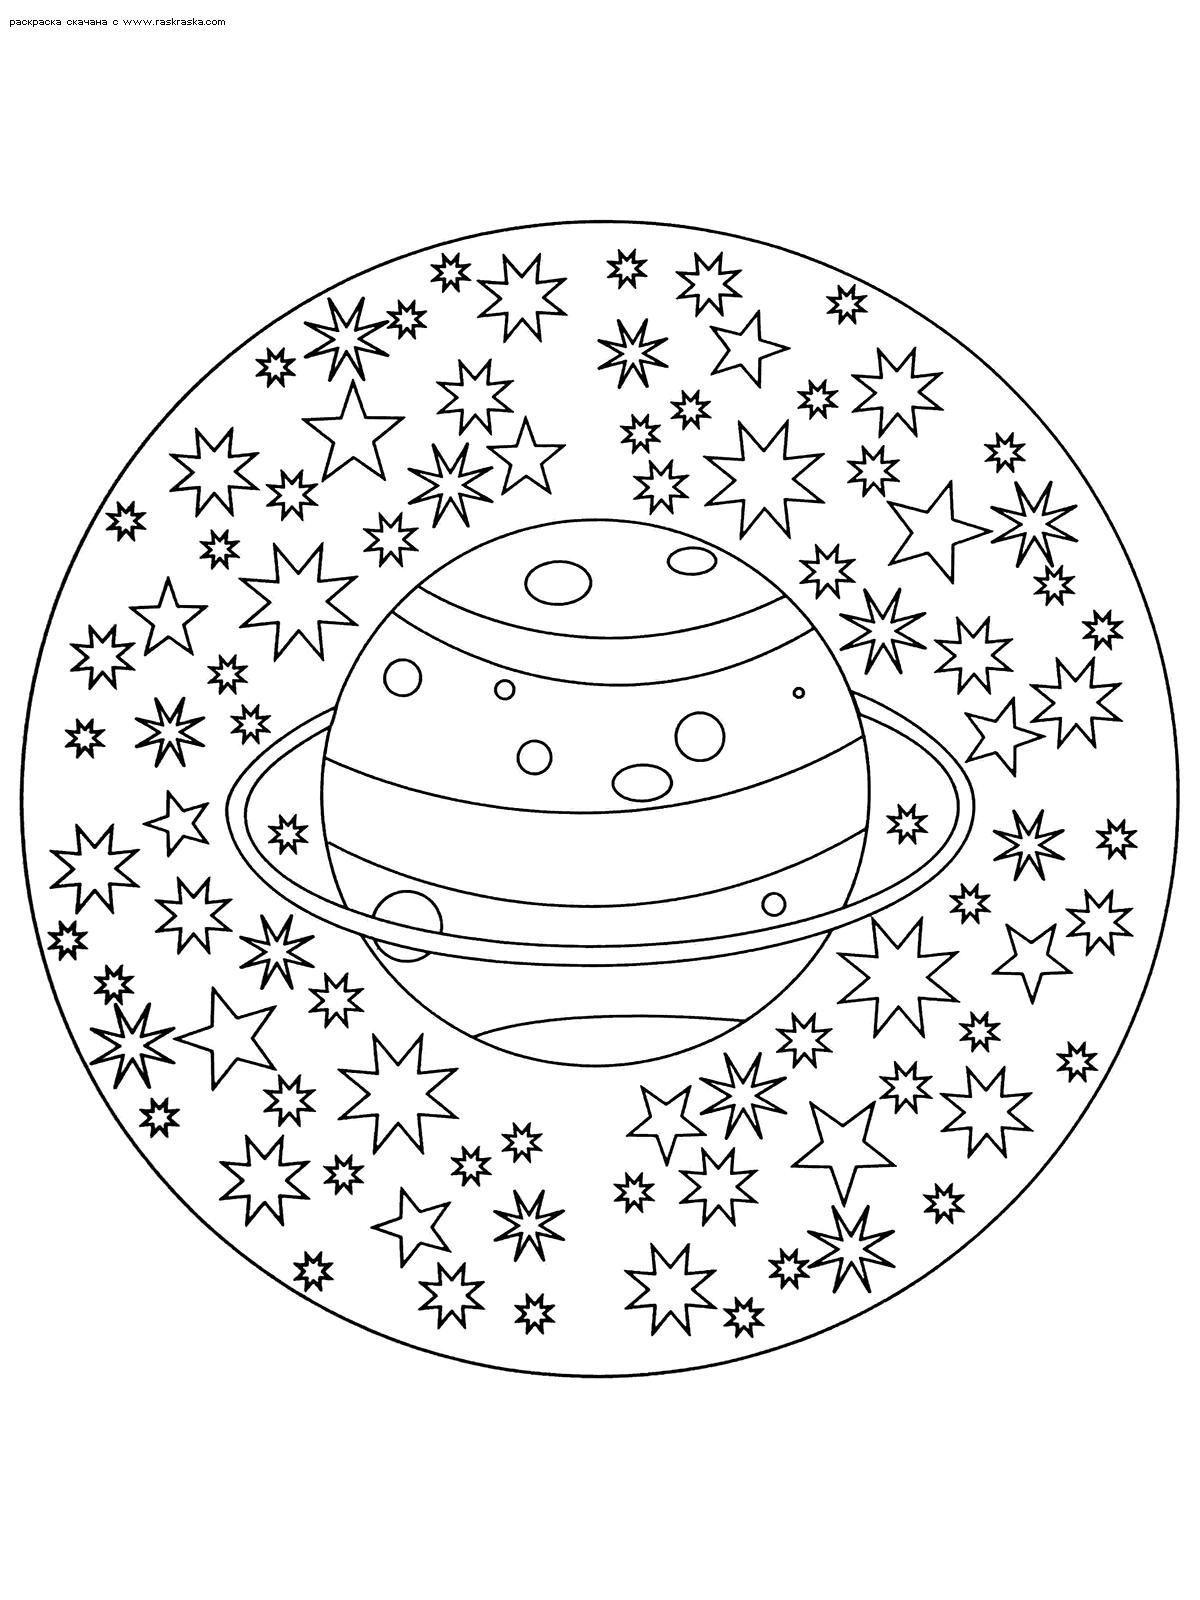 Раскраска Сатурн. Раскраска сатурн, антистресс, звезды